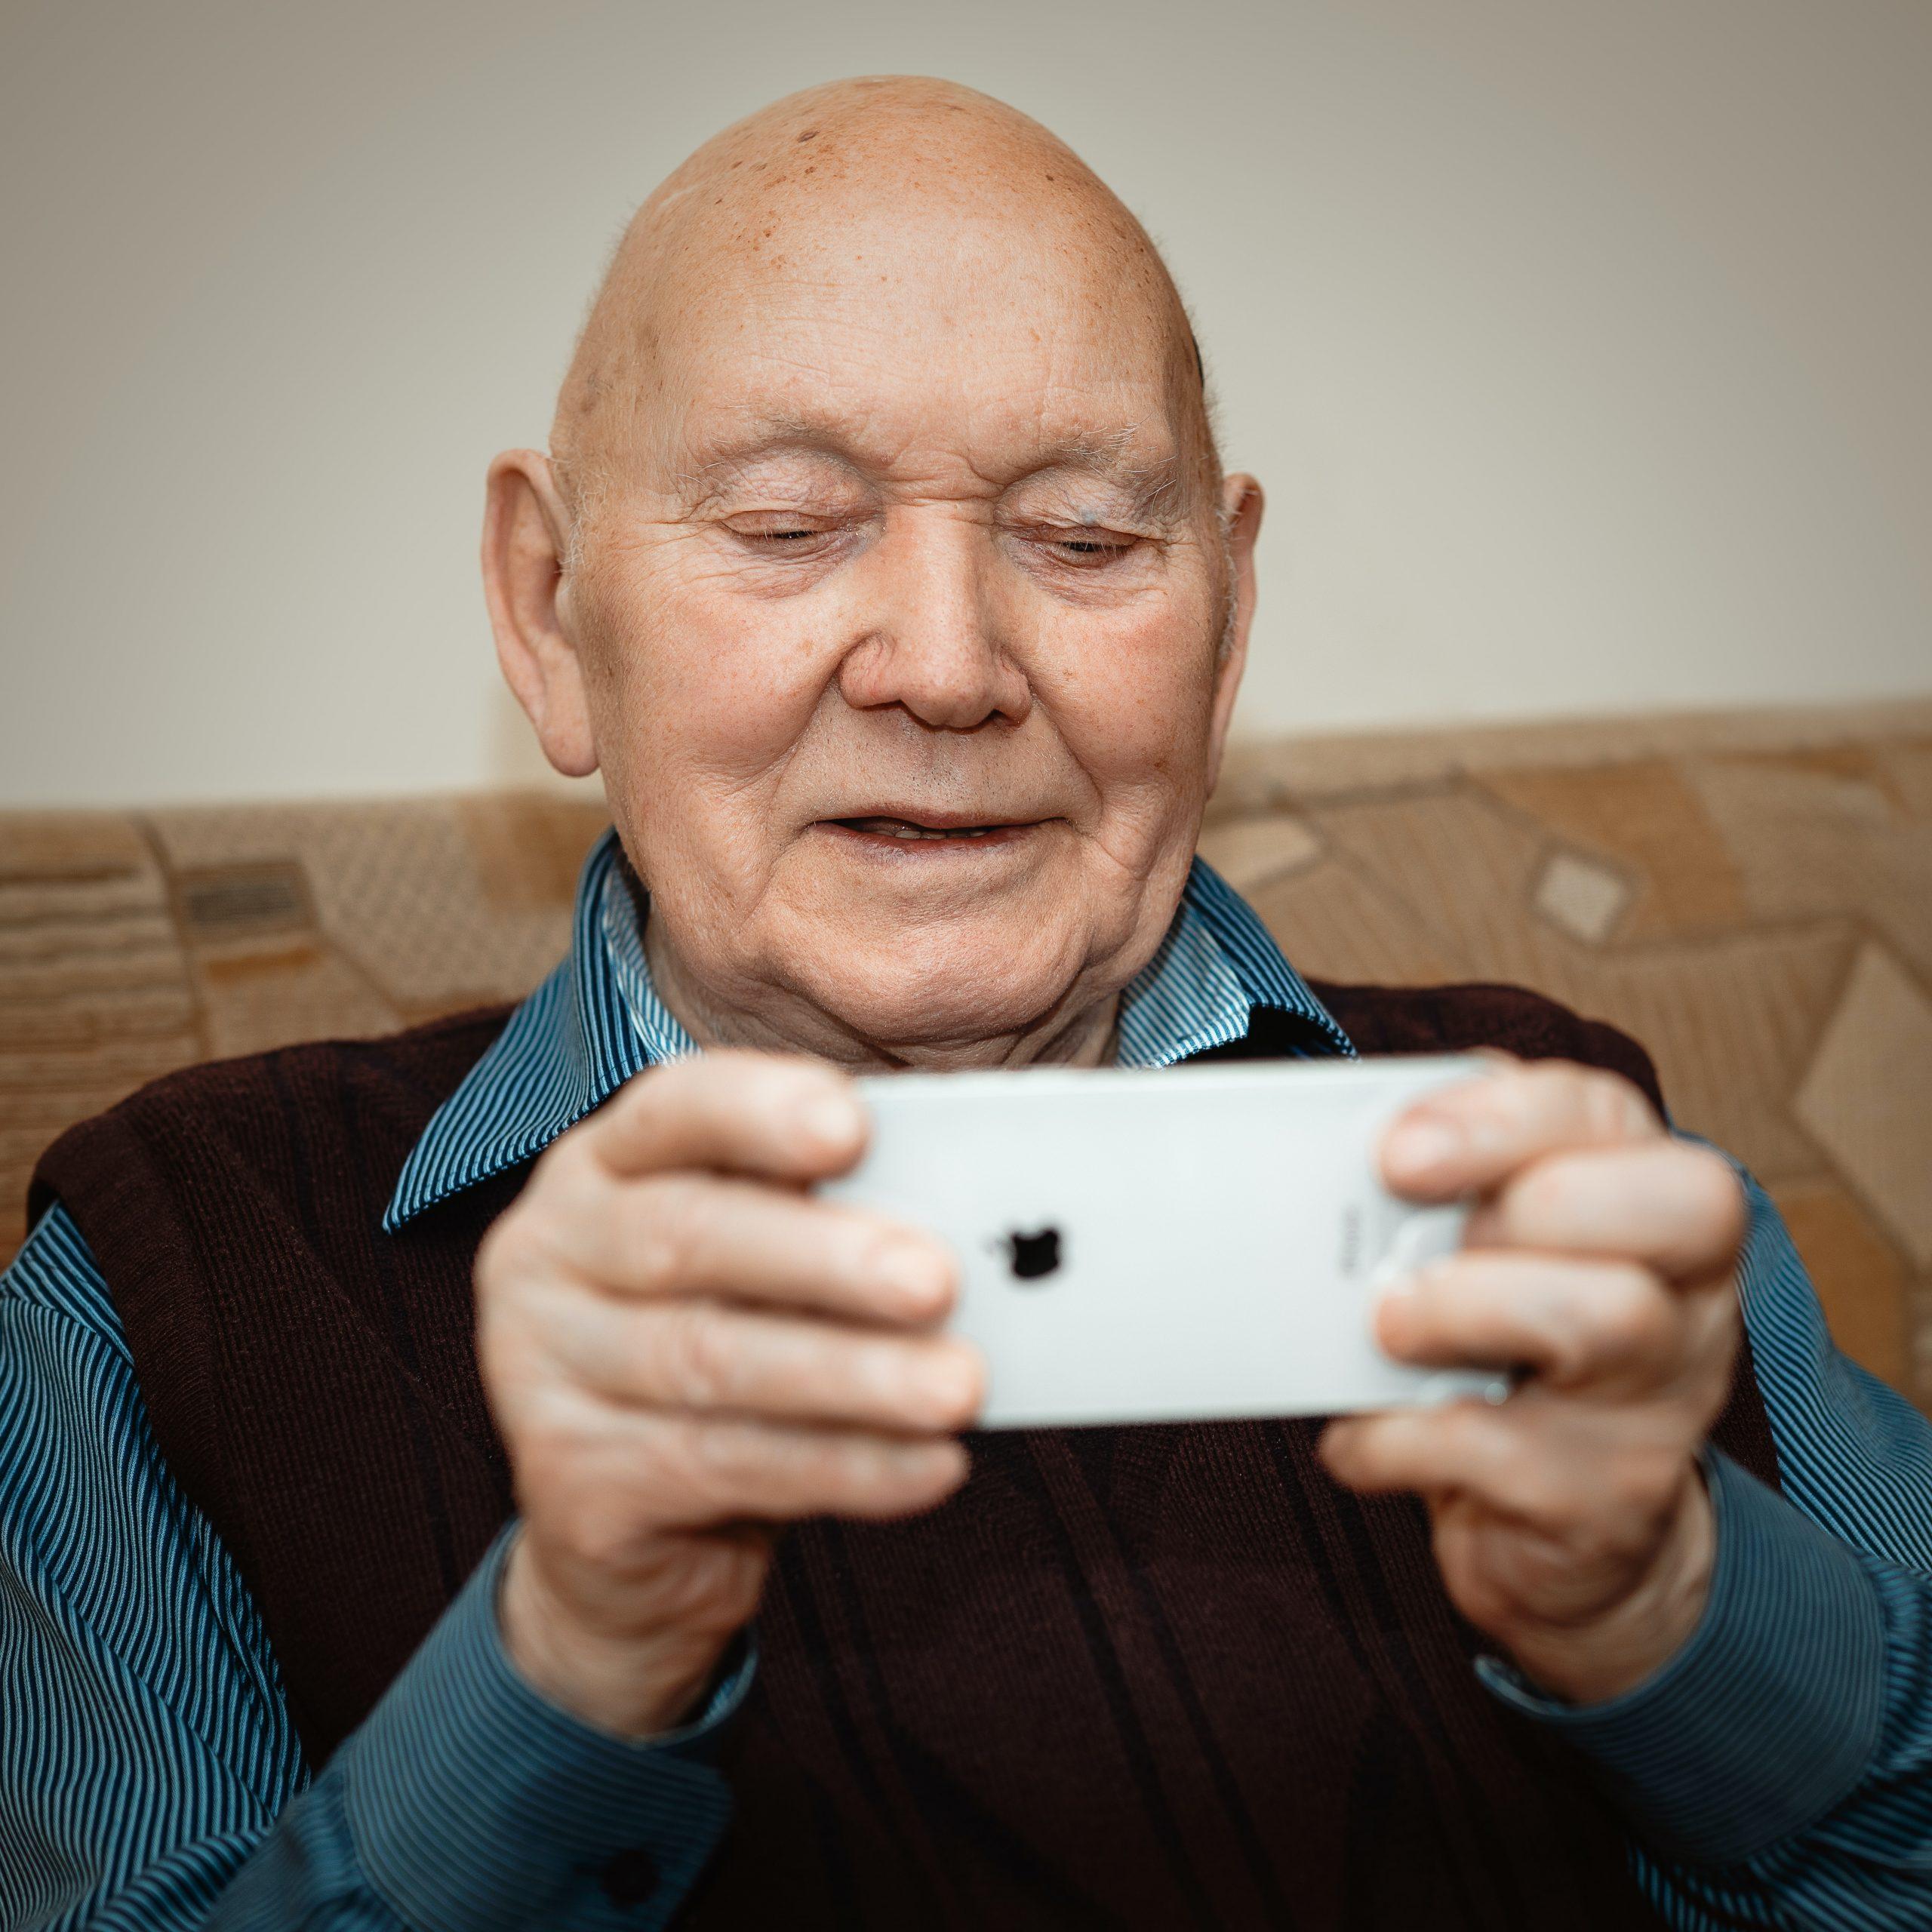 ældre. herre, mand, iphone Foto: Unsplash)